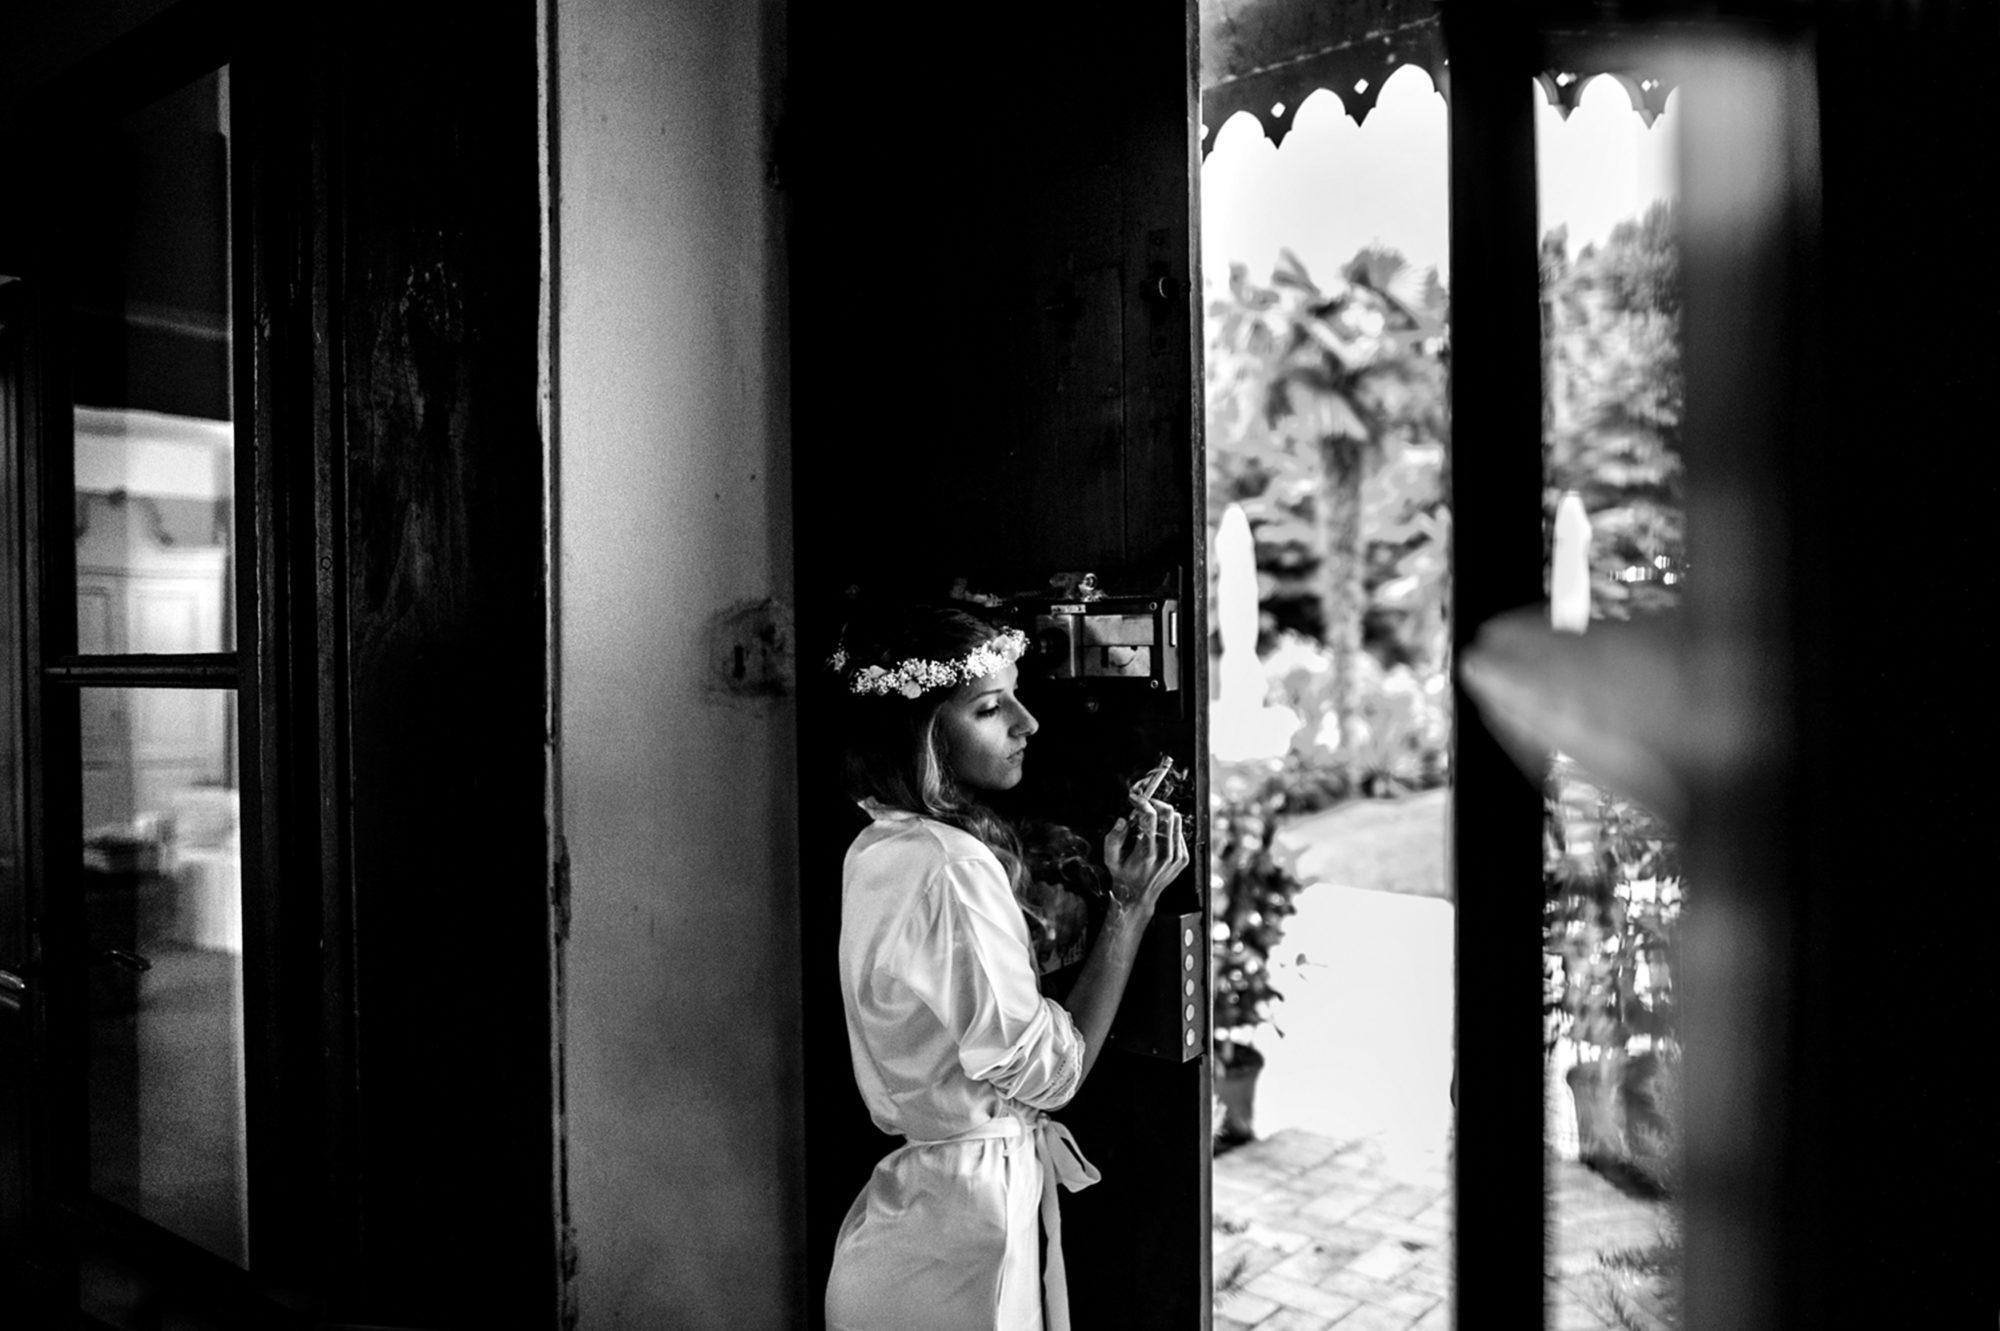 002gilbertiricca_conventodell'annunciata_fotografomatrimonio_2015